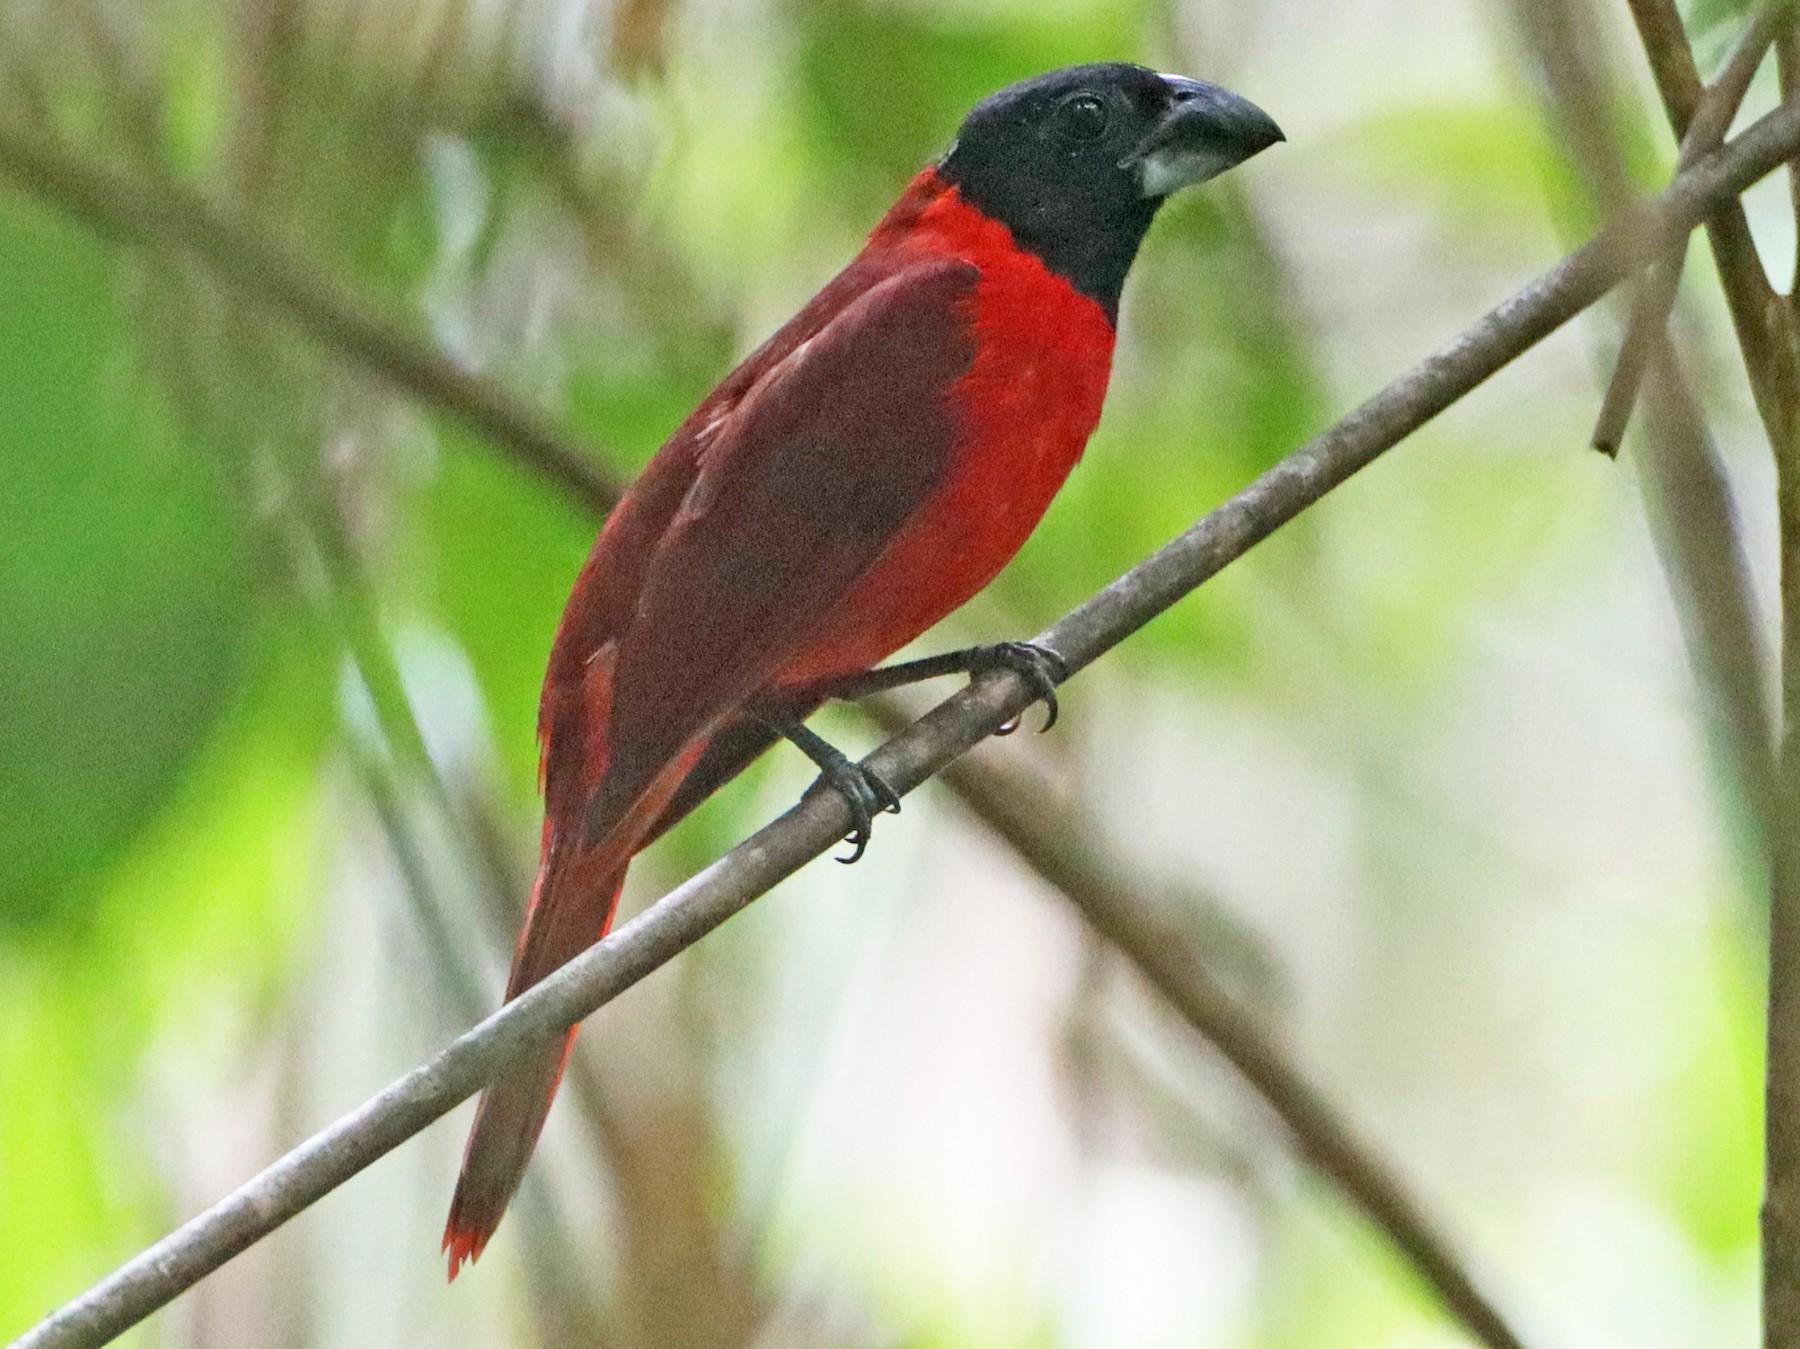 Red-and-black Grosbeak - Luke Seitz